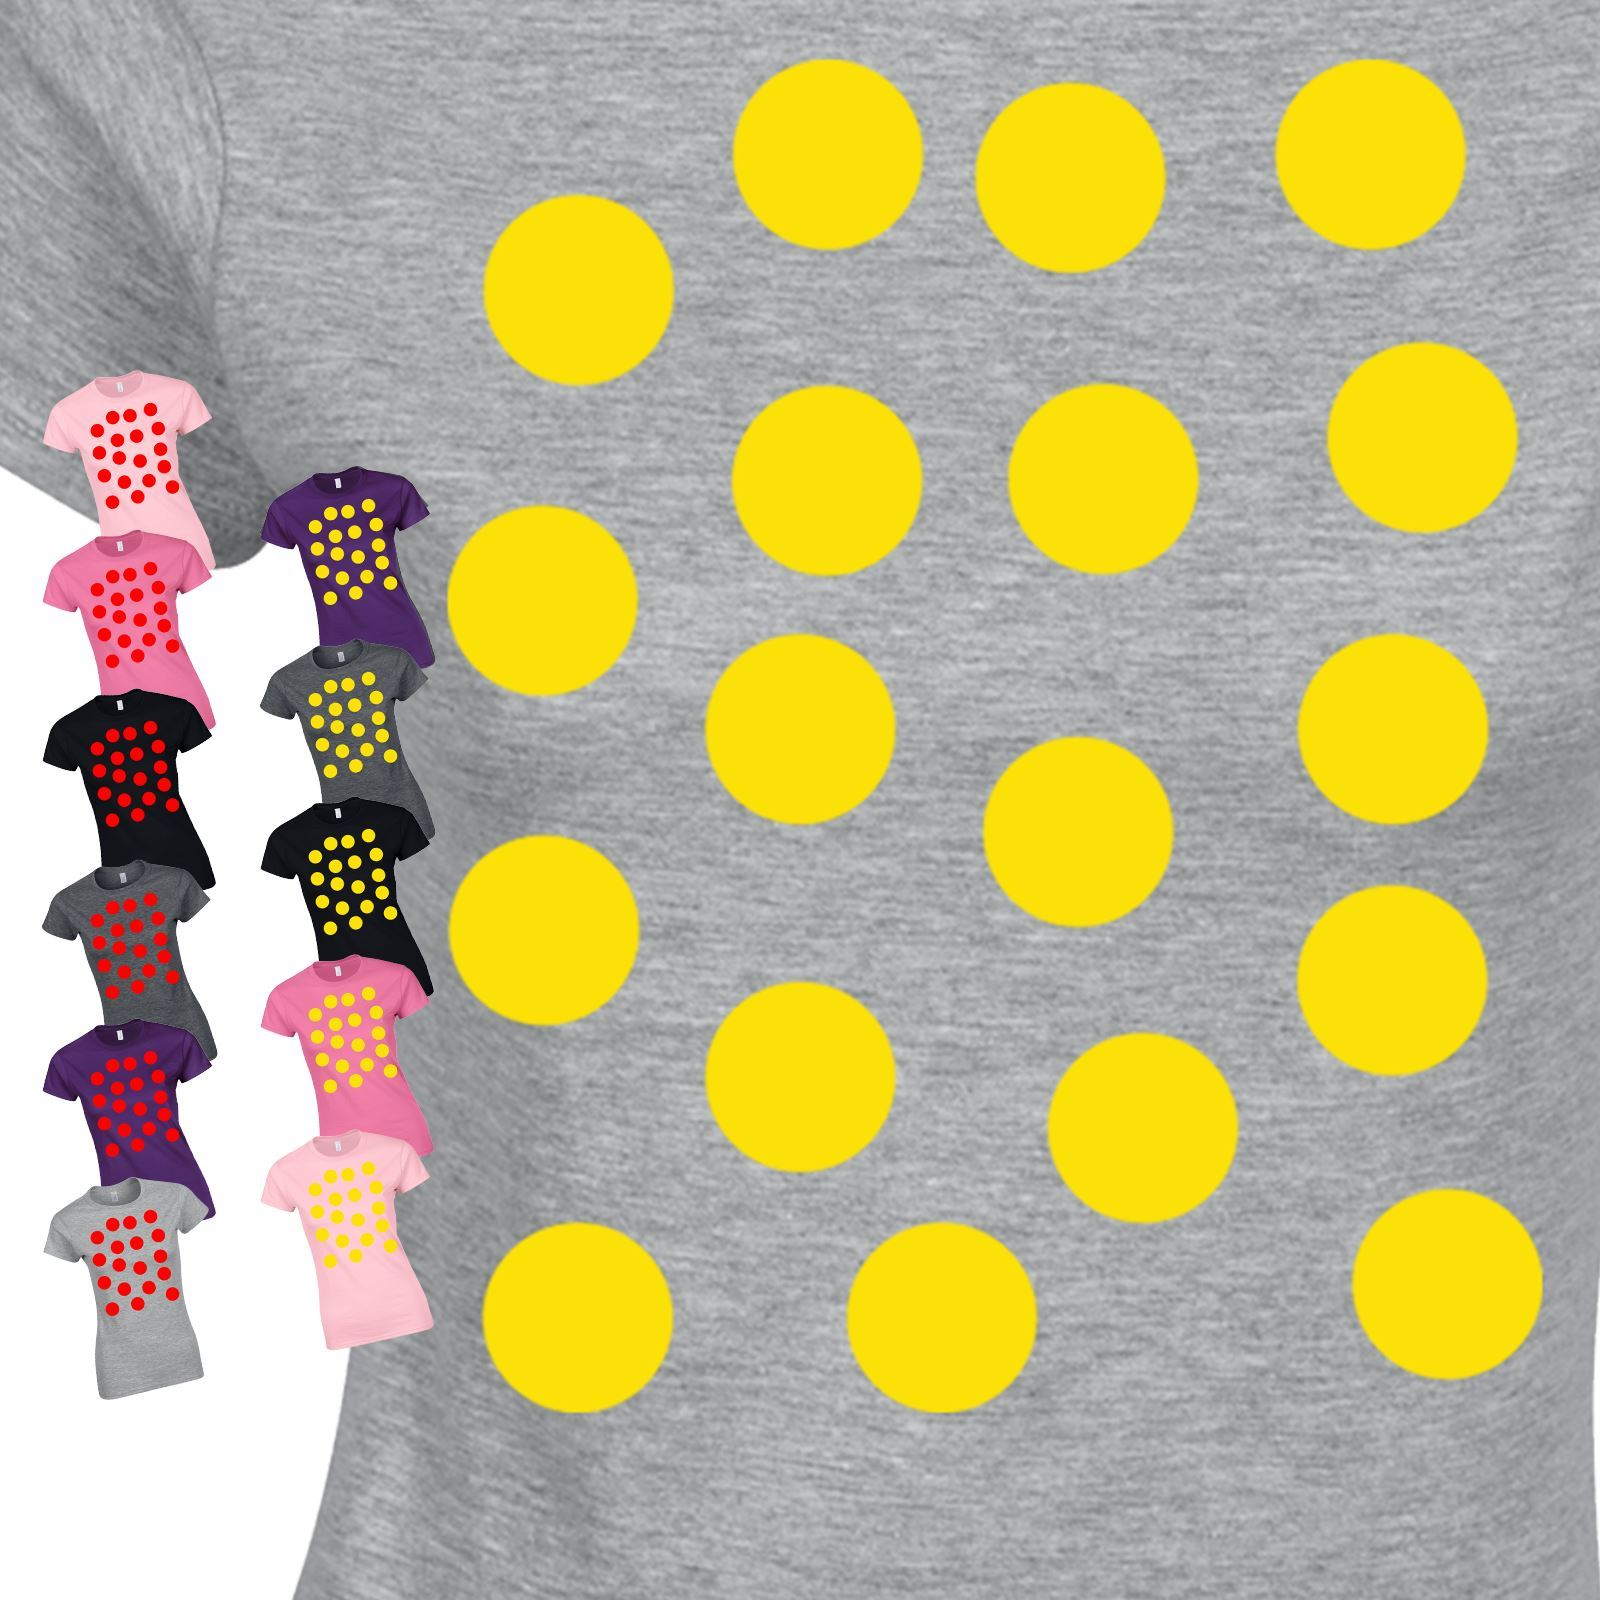 Polka Dots Spotty Day Costume Fancy Dress Present Top Inspired Women Tshirt